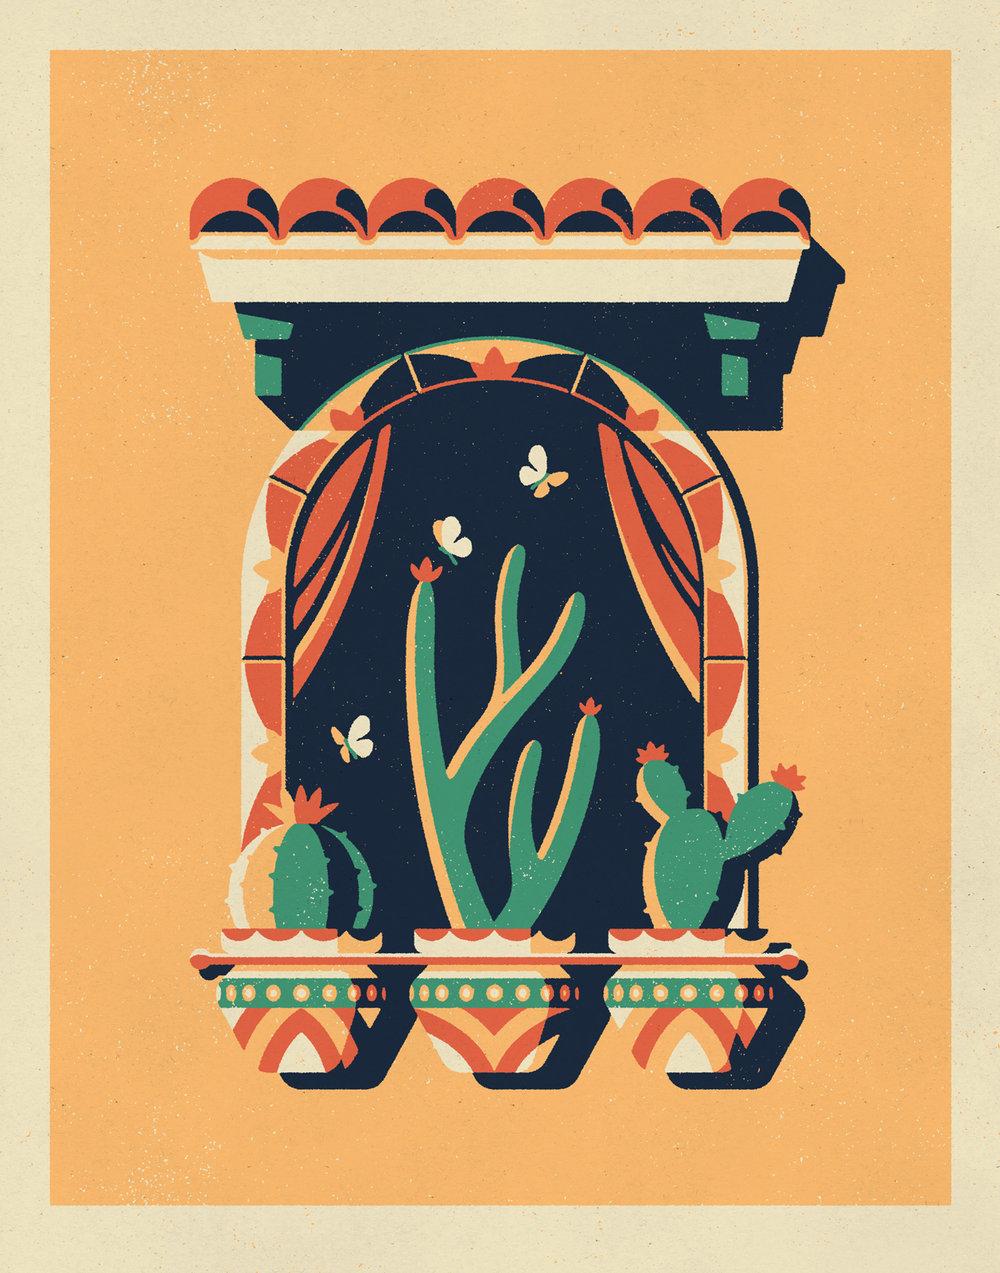 Veracruz Art Print by DKNG